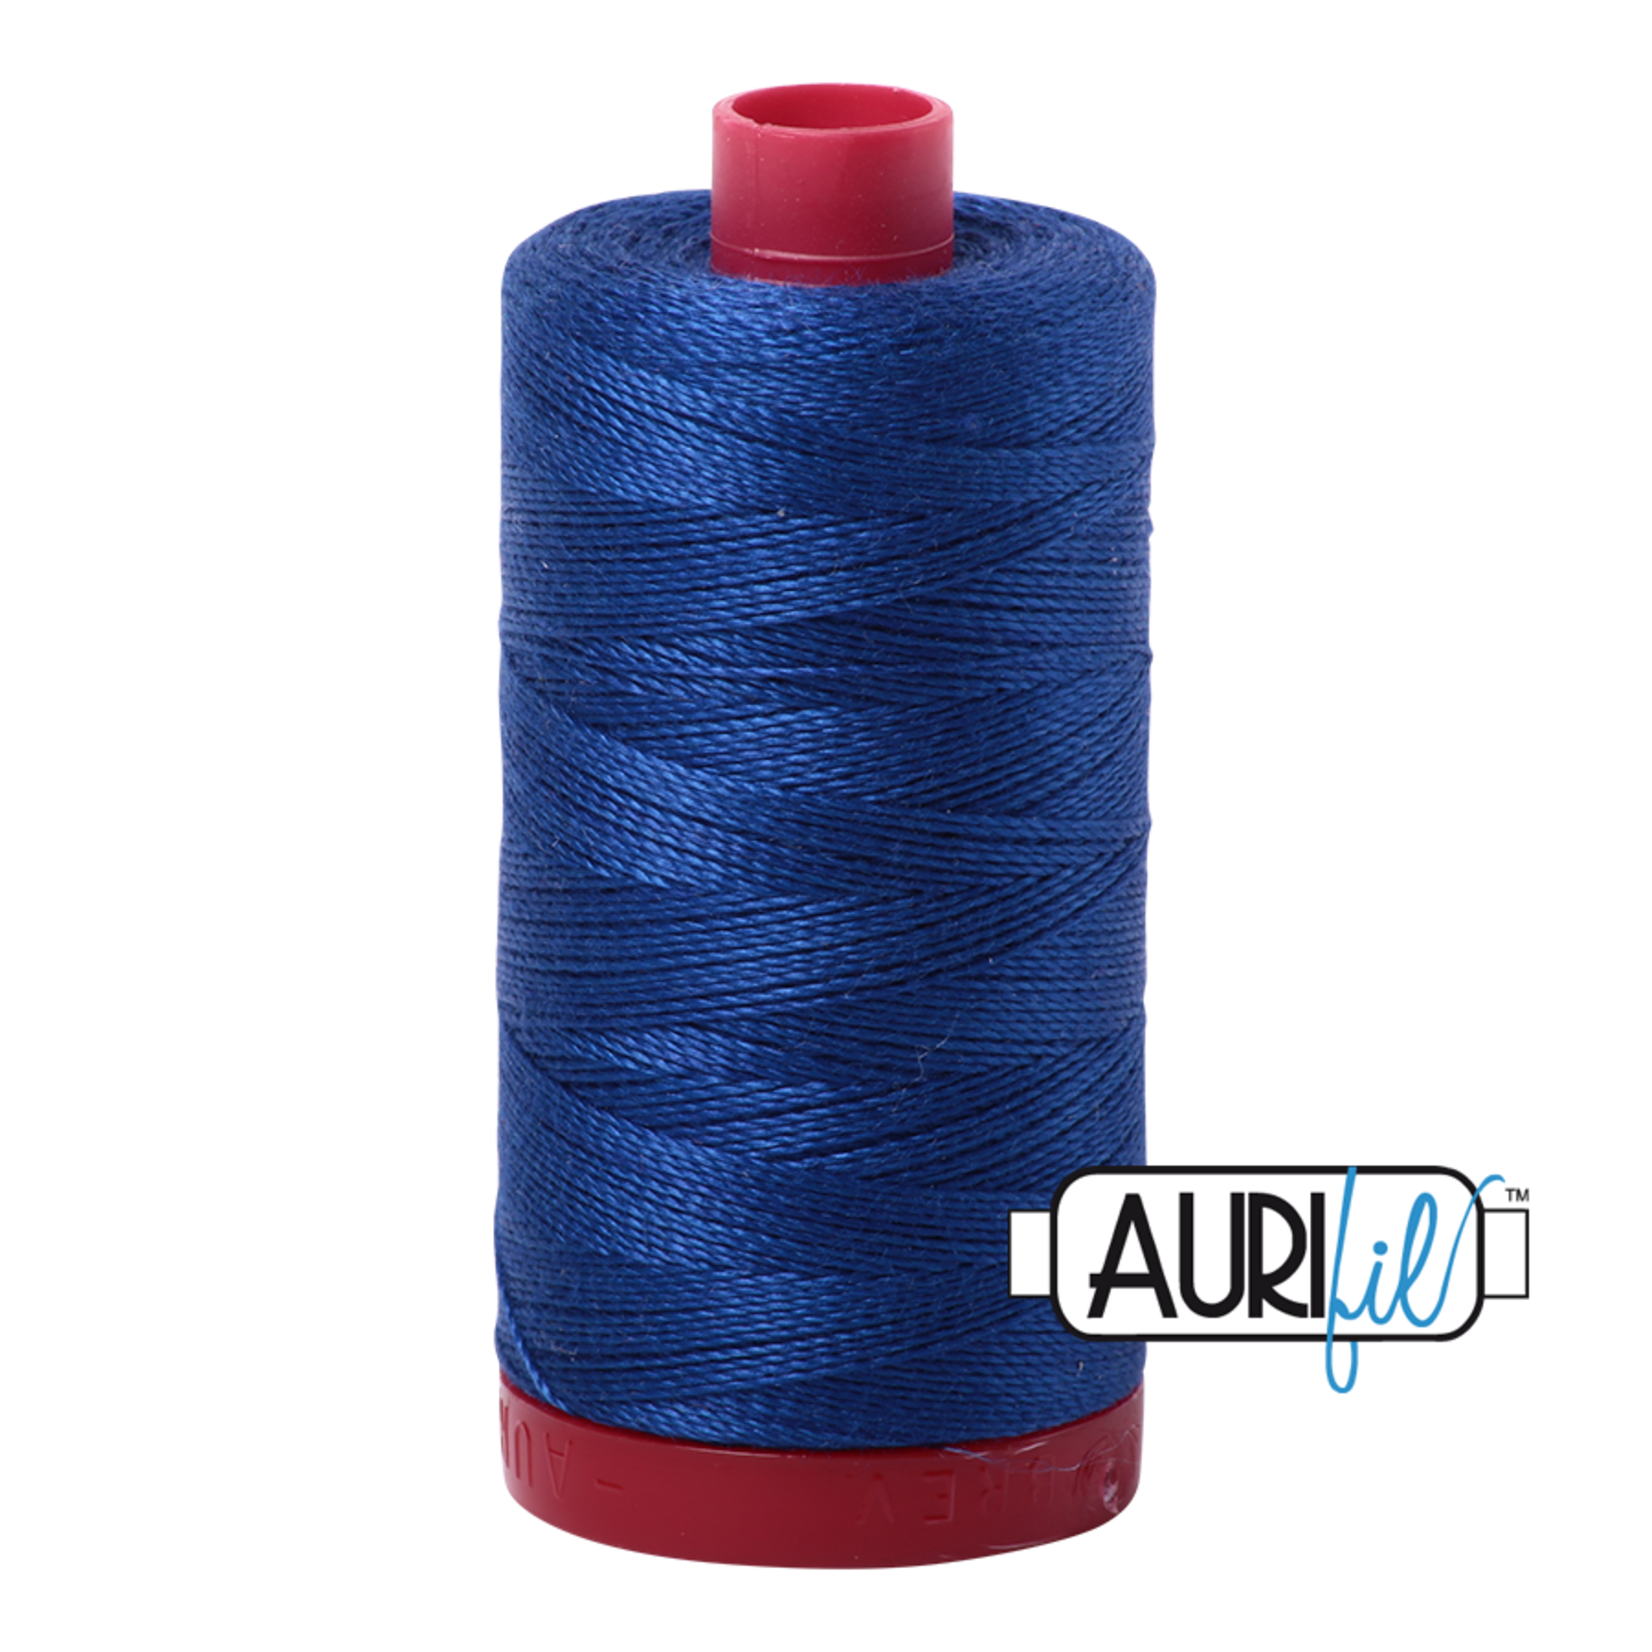 AURIFIL AURIFIL 12 WT Dark Cobalt 2740